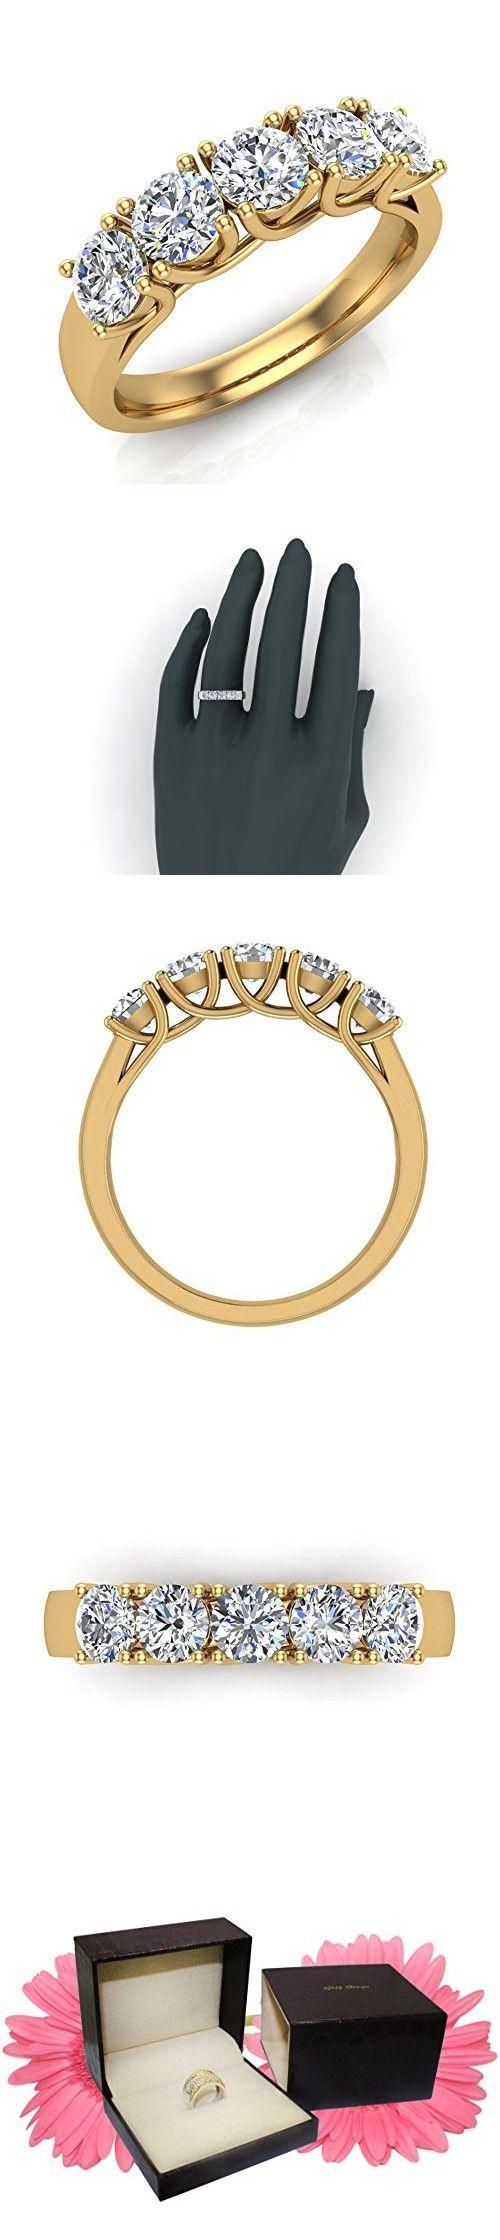 bb11ce9ab3b5 Five-Stone Wedding Band 14K Gold Classic Trellis Setting Diamond Ring 1.10  Carat Total Weight (G